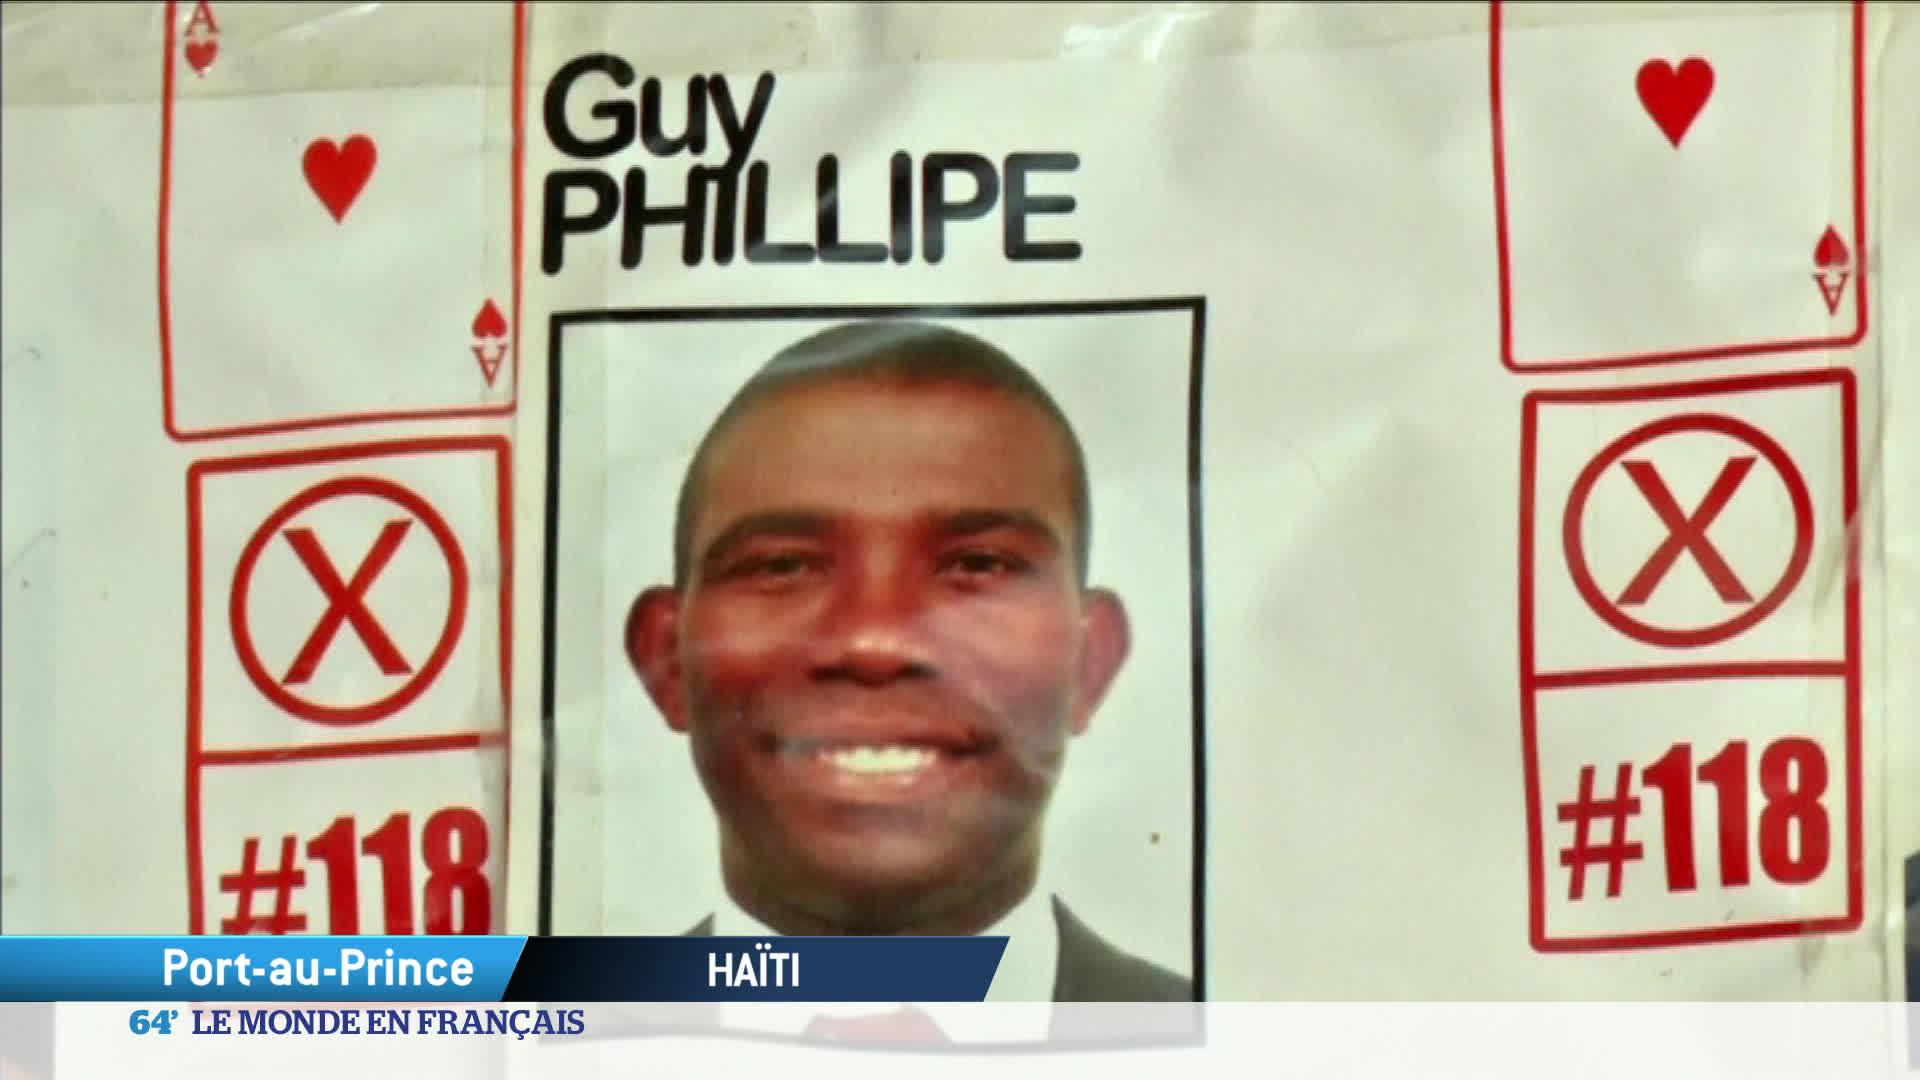 Haïti : l'arrestation de Guy Philippe